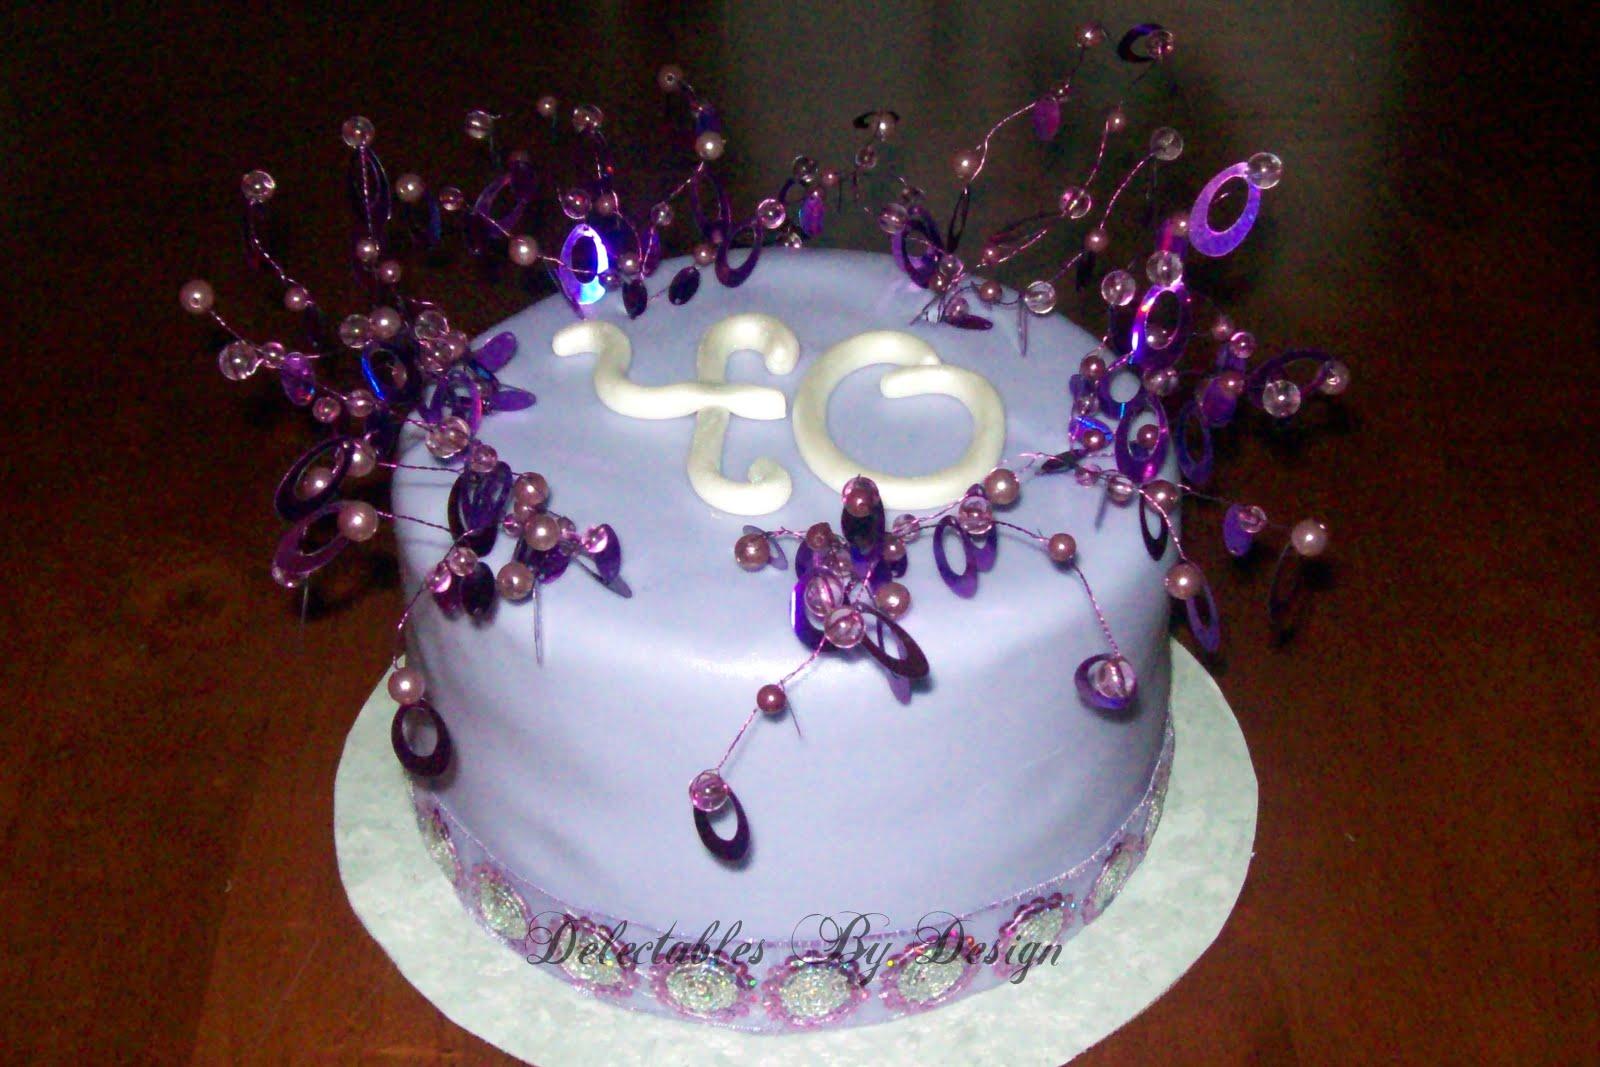 Cake Designs For 40th Birthday